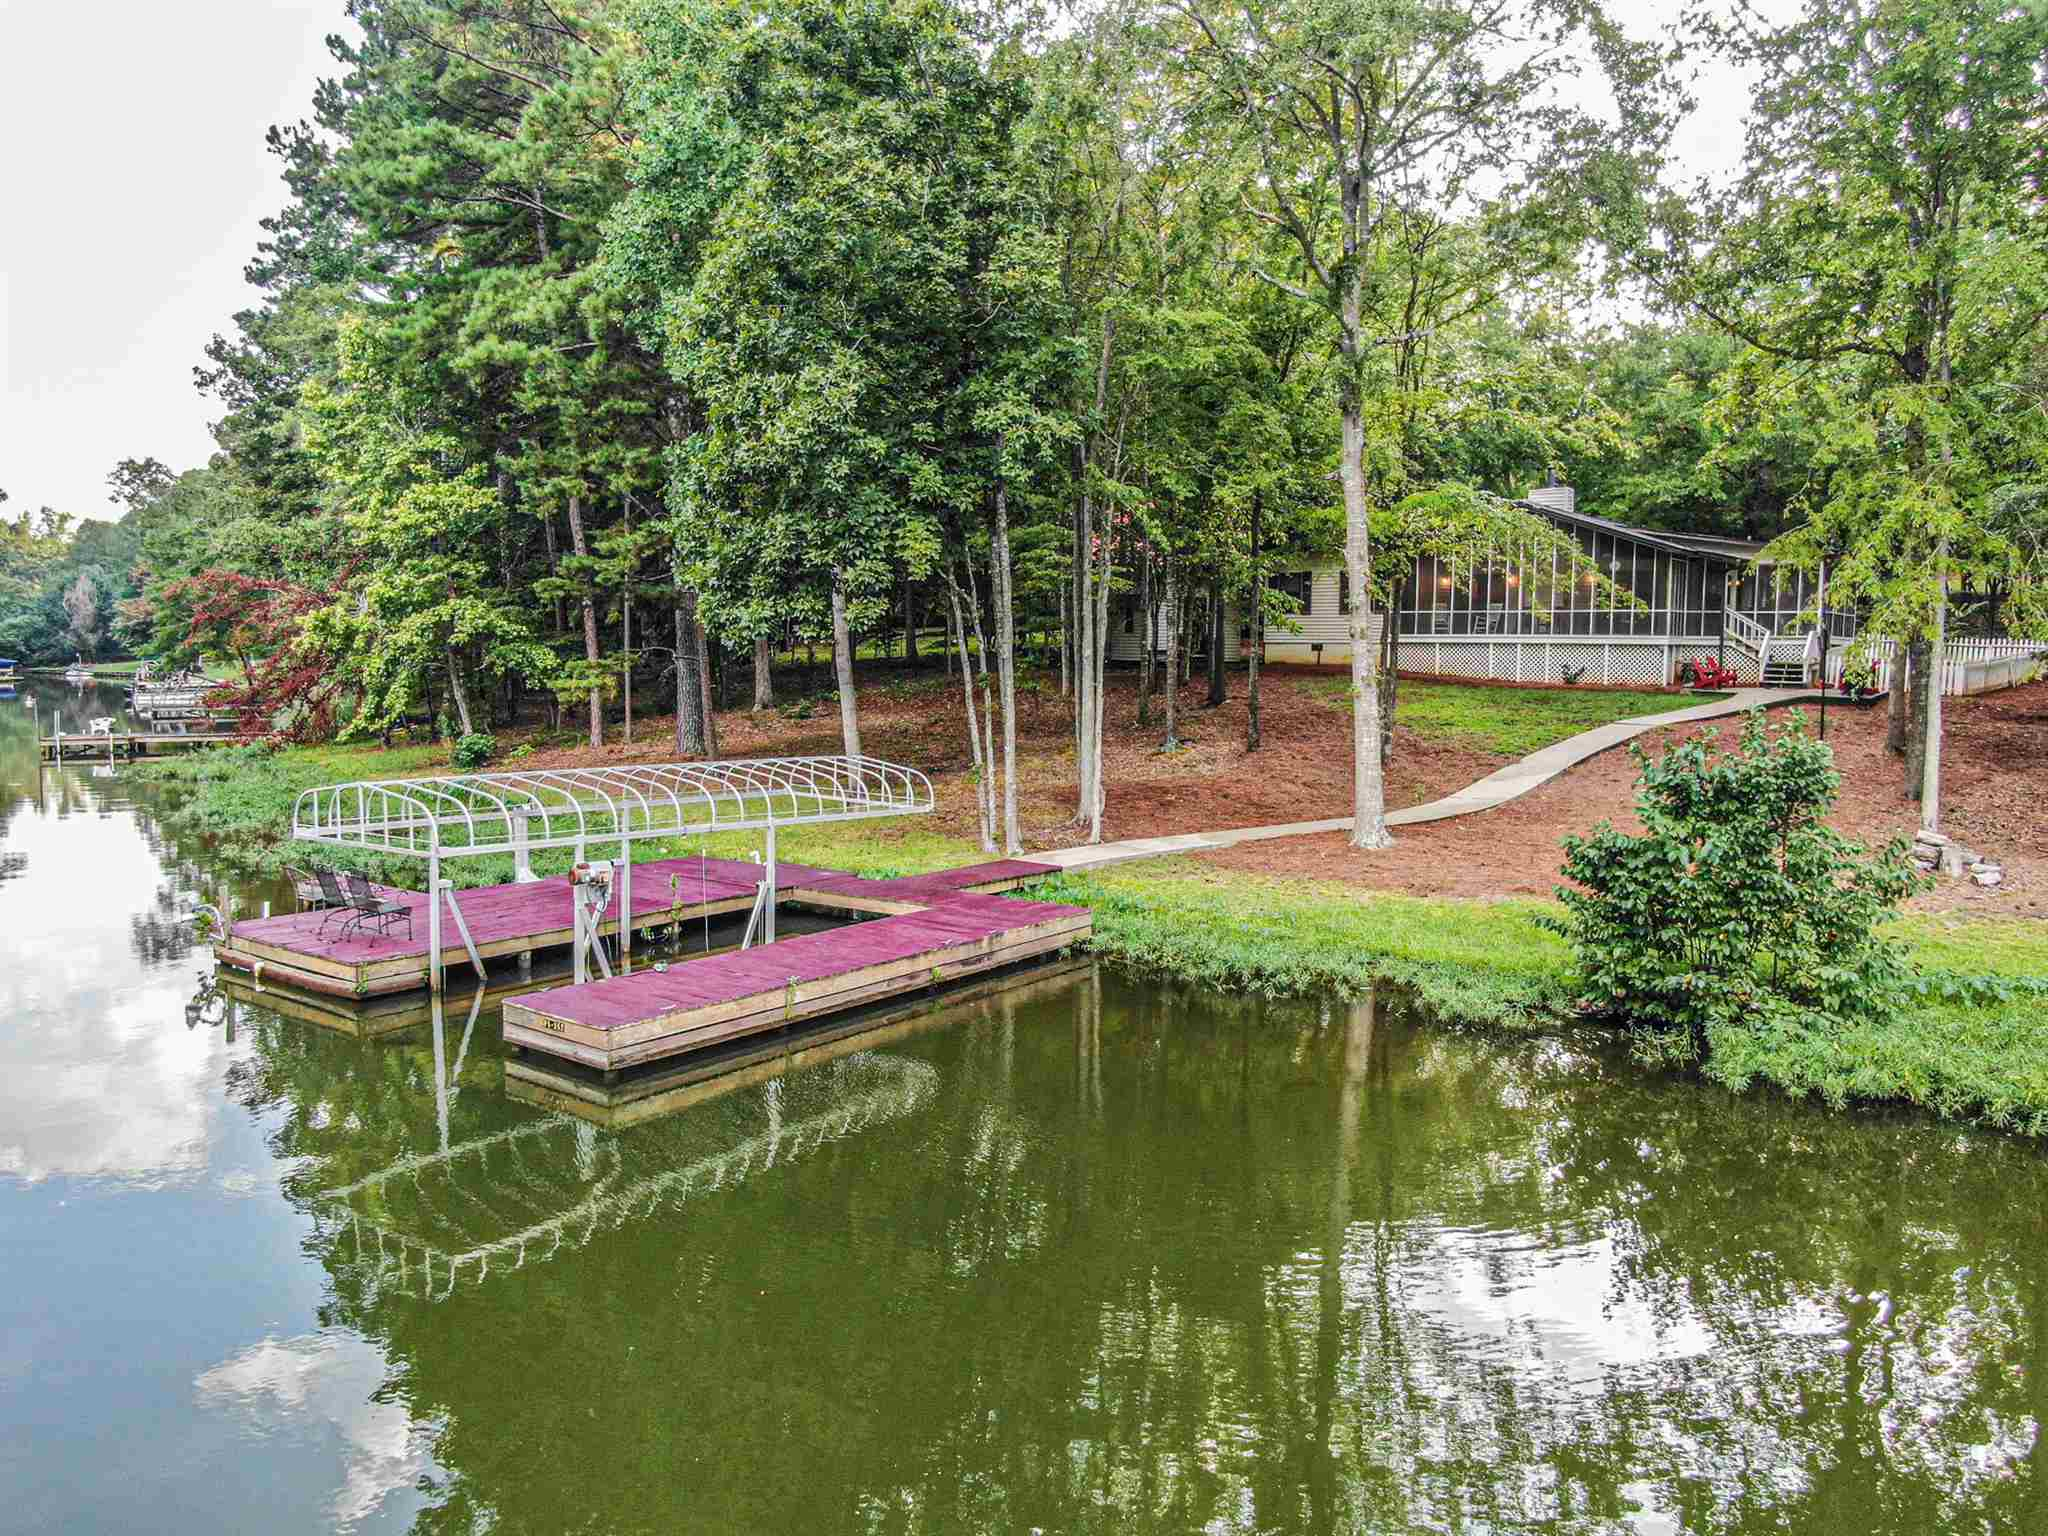 268 WEST RIVERBEND DRIVE, Lake Oconee in Putnam County, GA 31024 Home for Sale